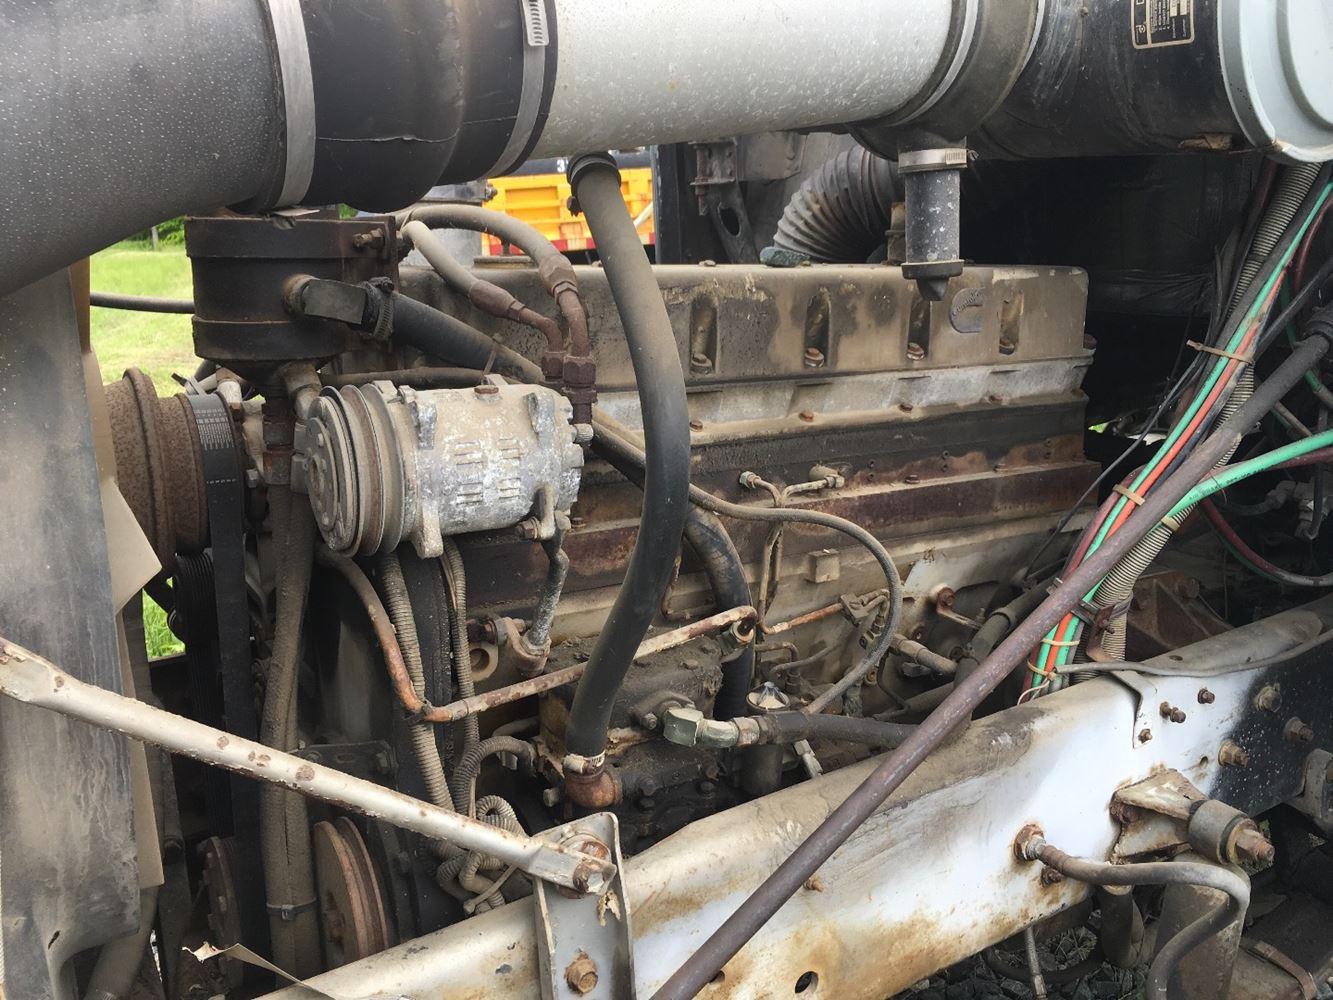 1986 CUMMINS LTA ENGINE ASSEMBLY TRUCK PARTS #679962